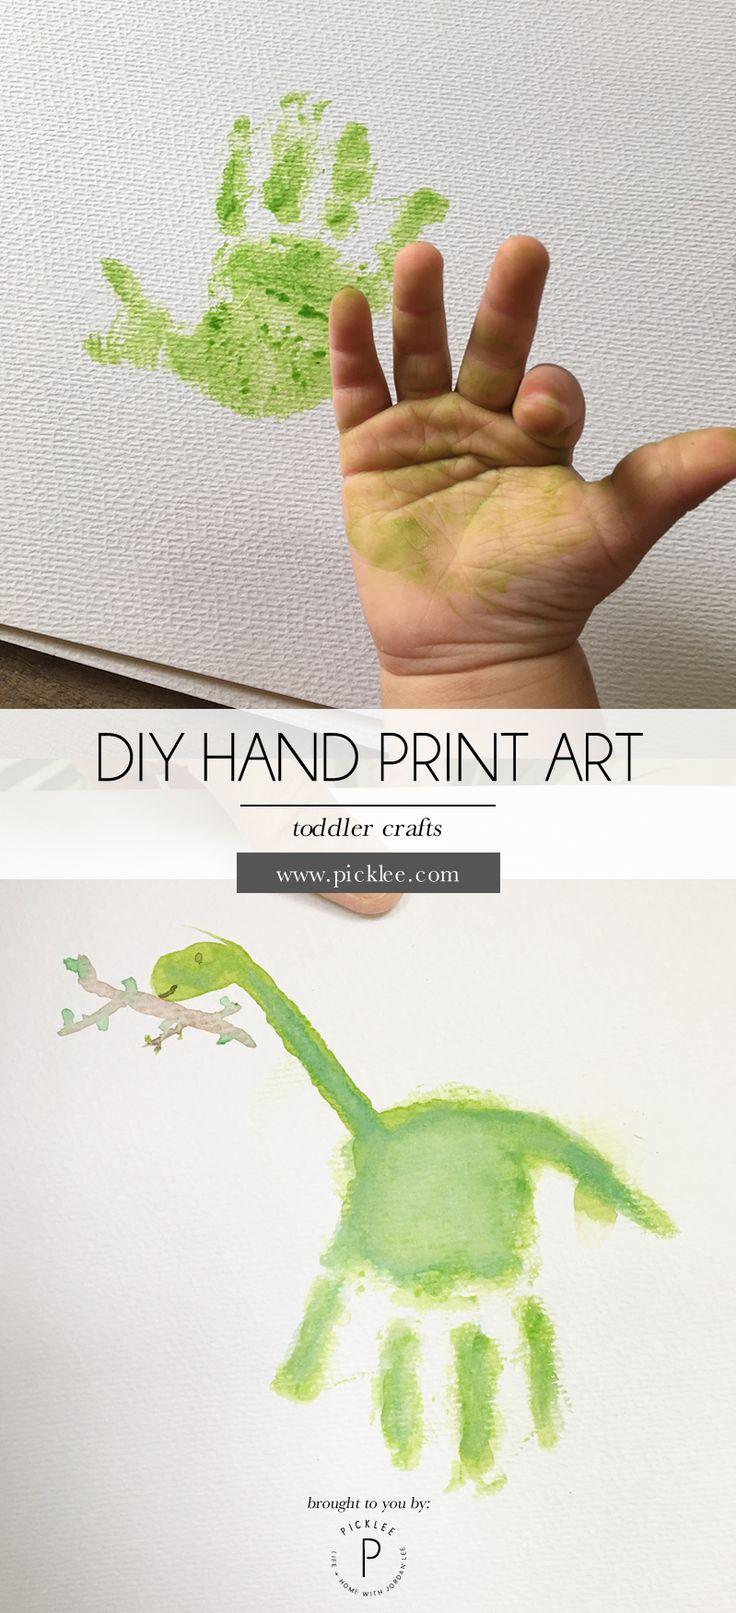 looklacquered furniture inspriation picklee. DIY Hand Print Art , A Dinosaur Print! Best Toddler Craft Ever! Looklacquered Furniture Inspriation Picklee